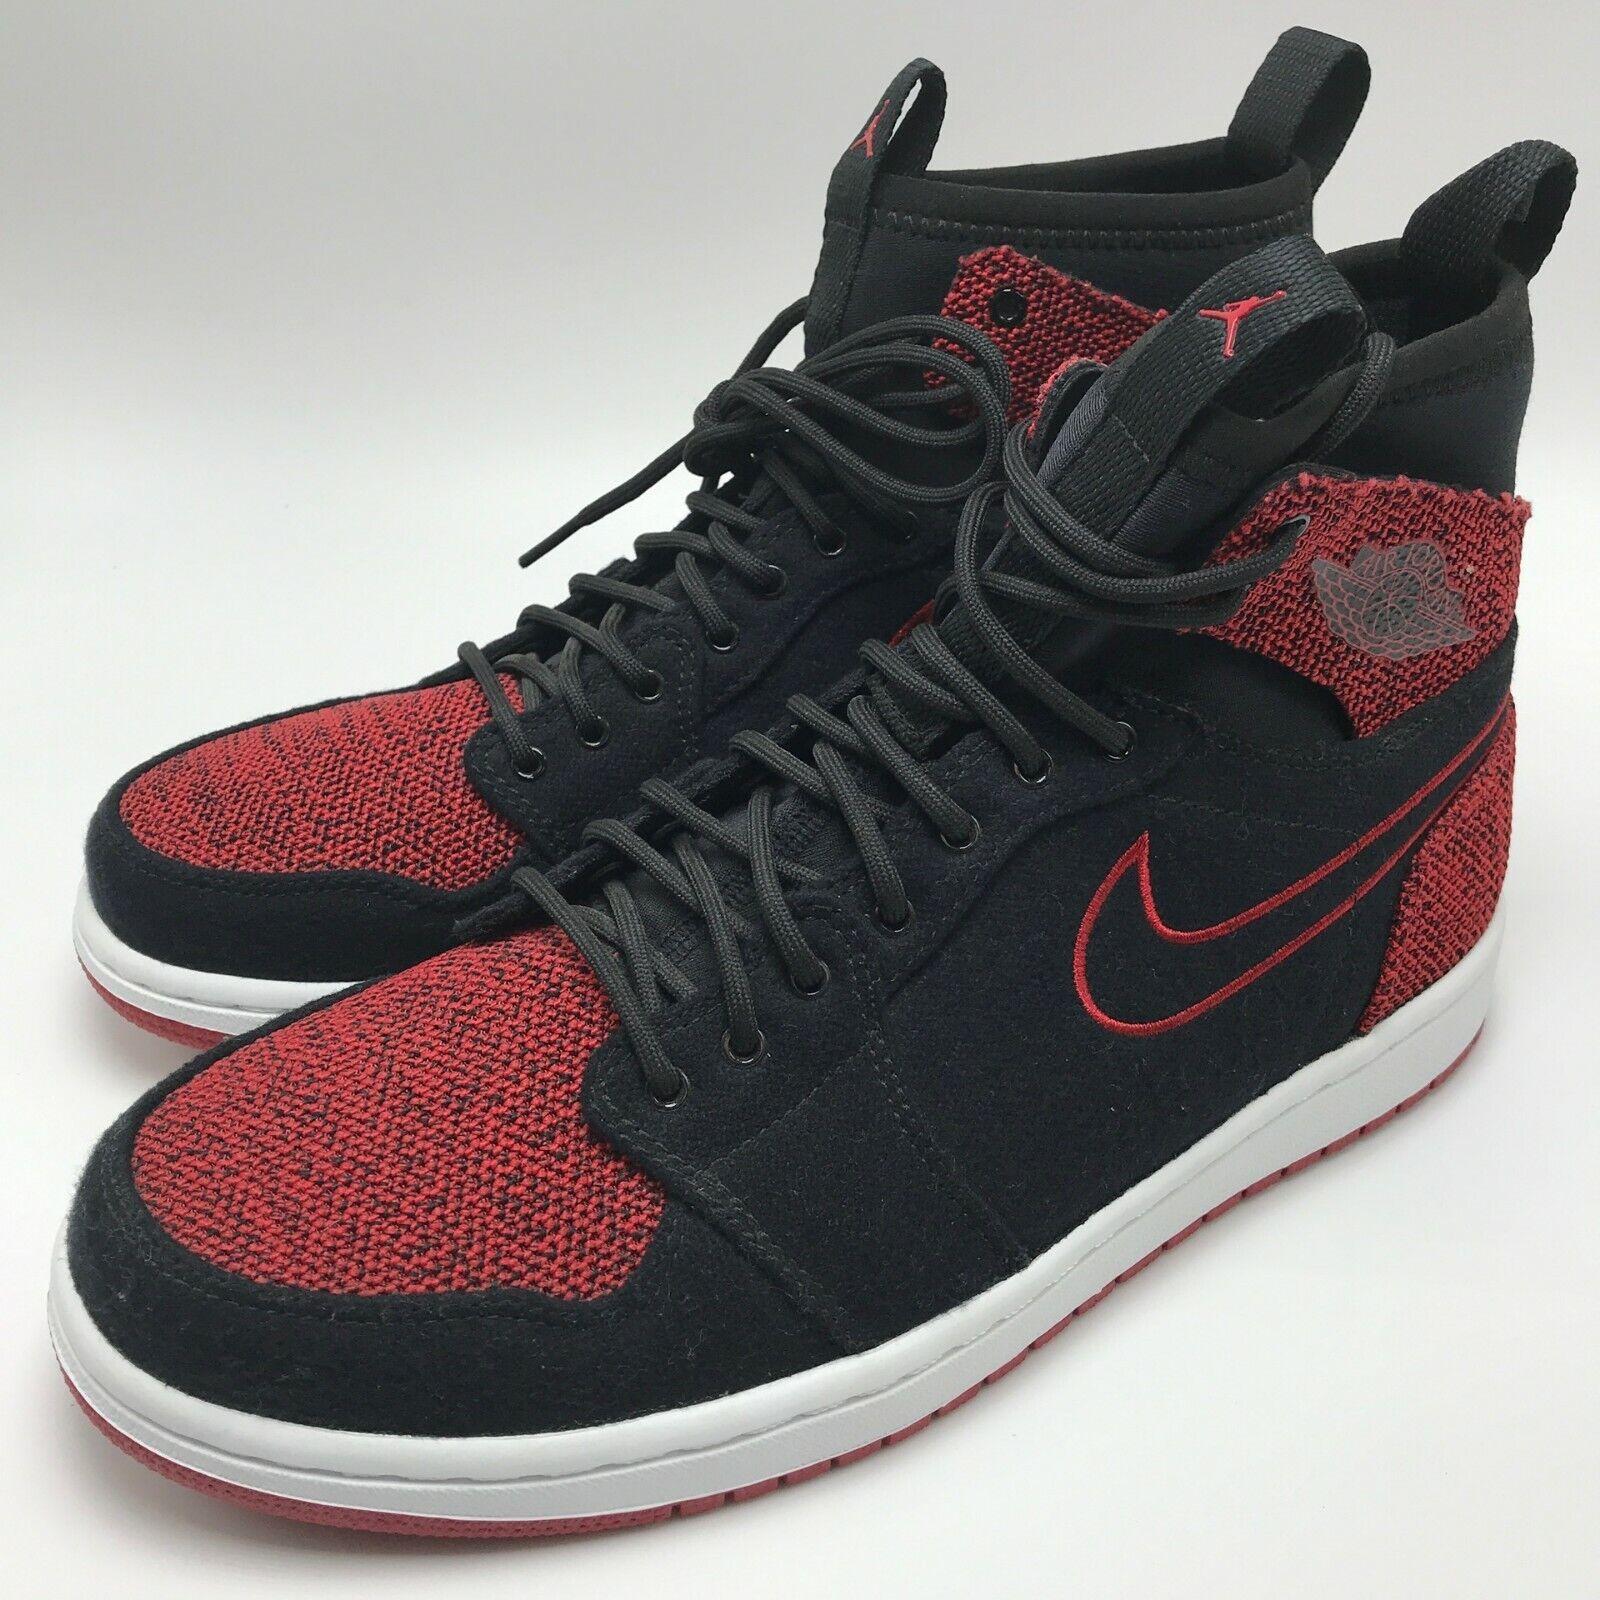 new arrival d14d0 44f05 Nike Air Jordan 1 Retro Ultra High Men's Shoes Black/Gym Red-White  844700-001